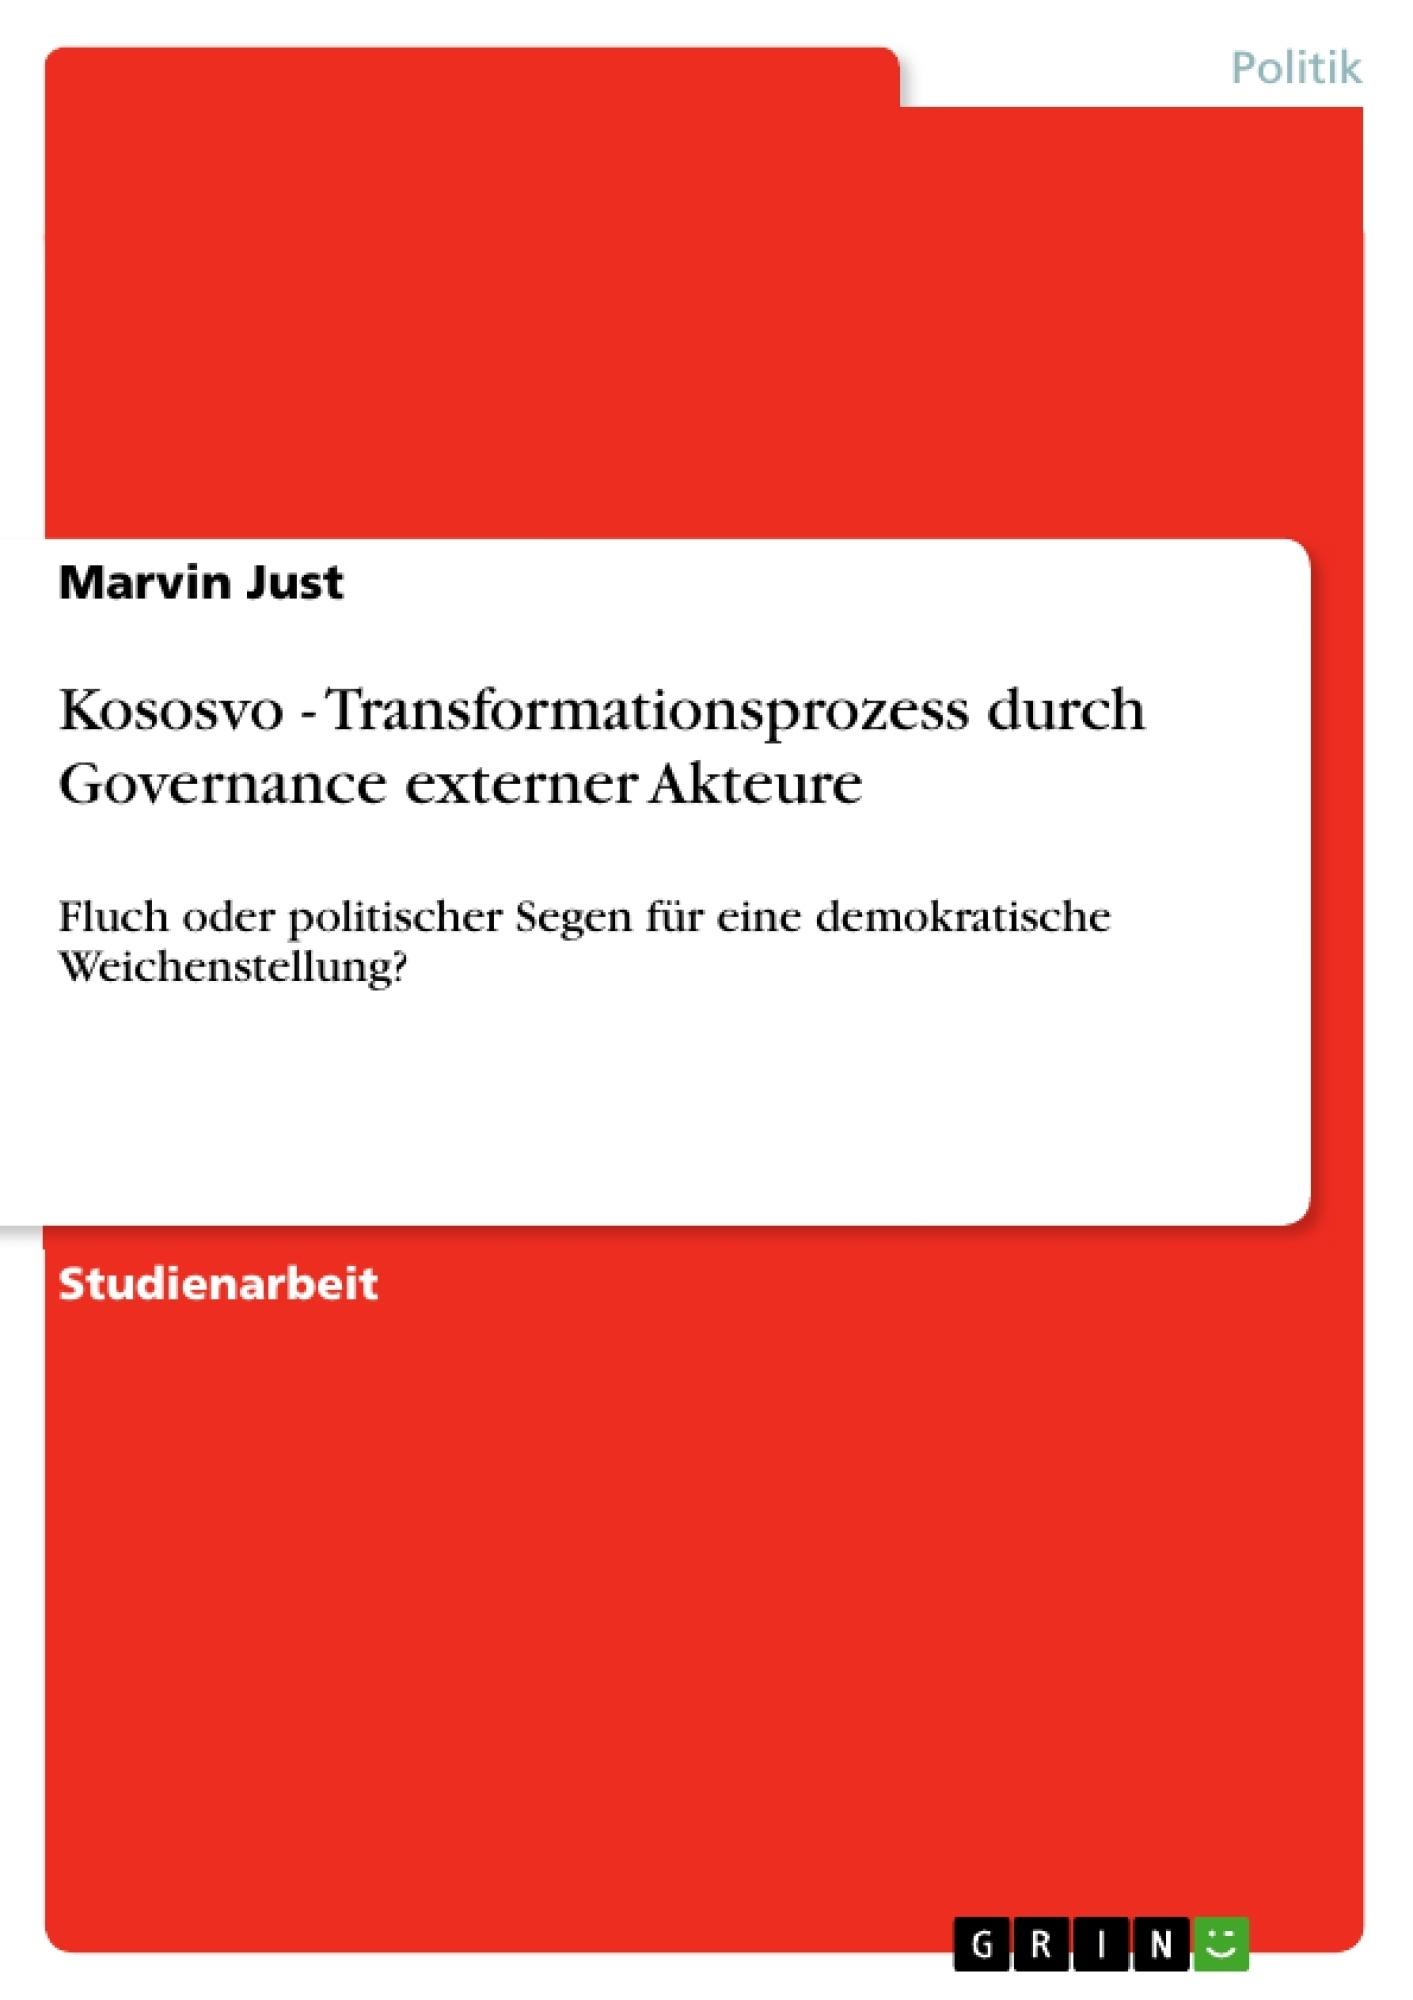 Titel: Kososvo - Transformationsprozess durch Governance externer Akteure